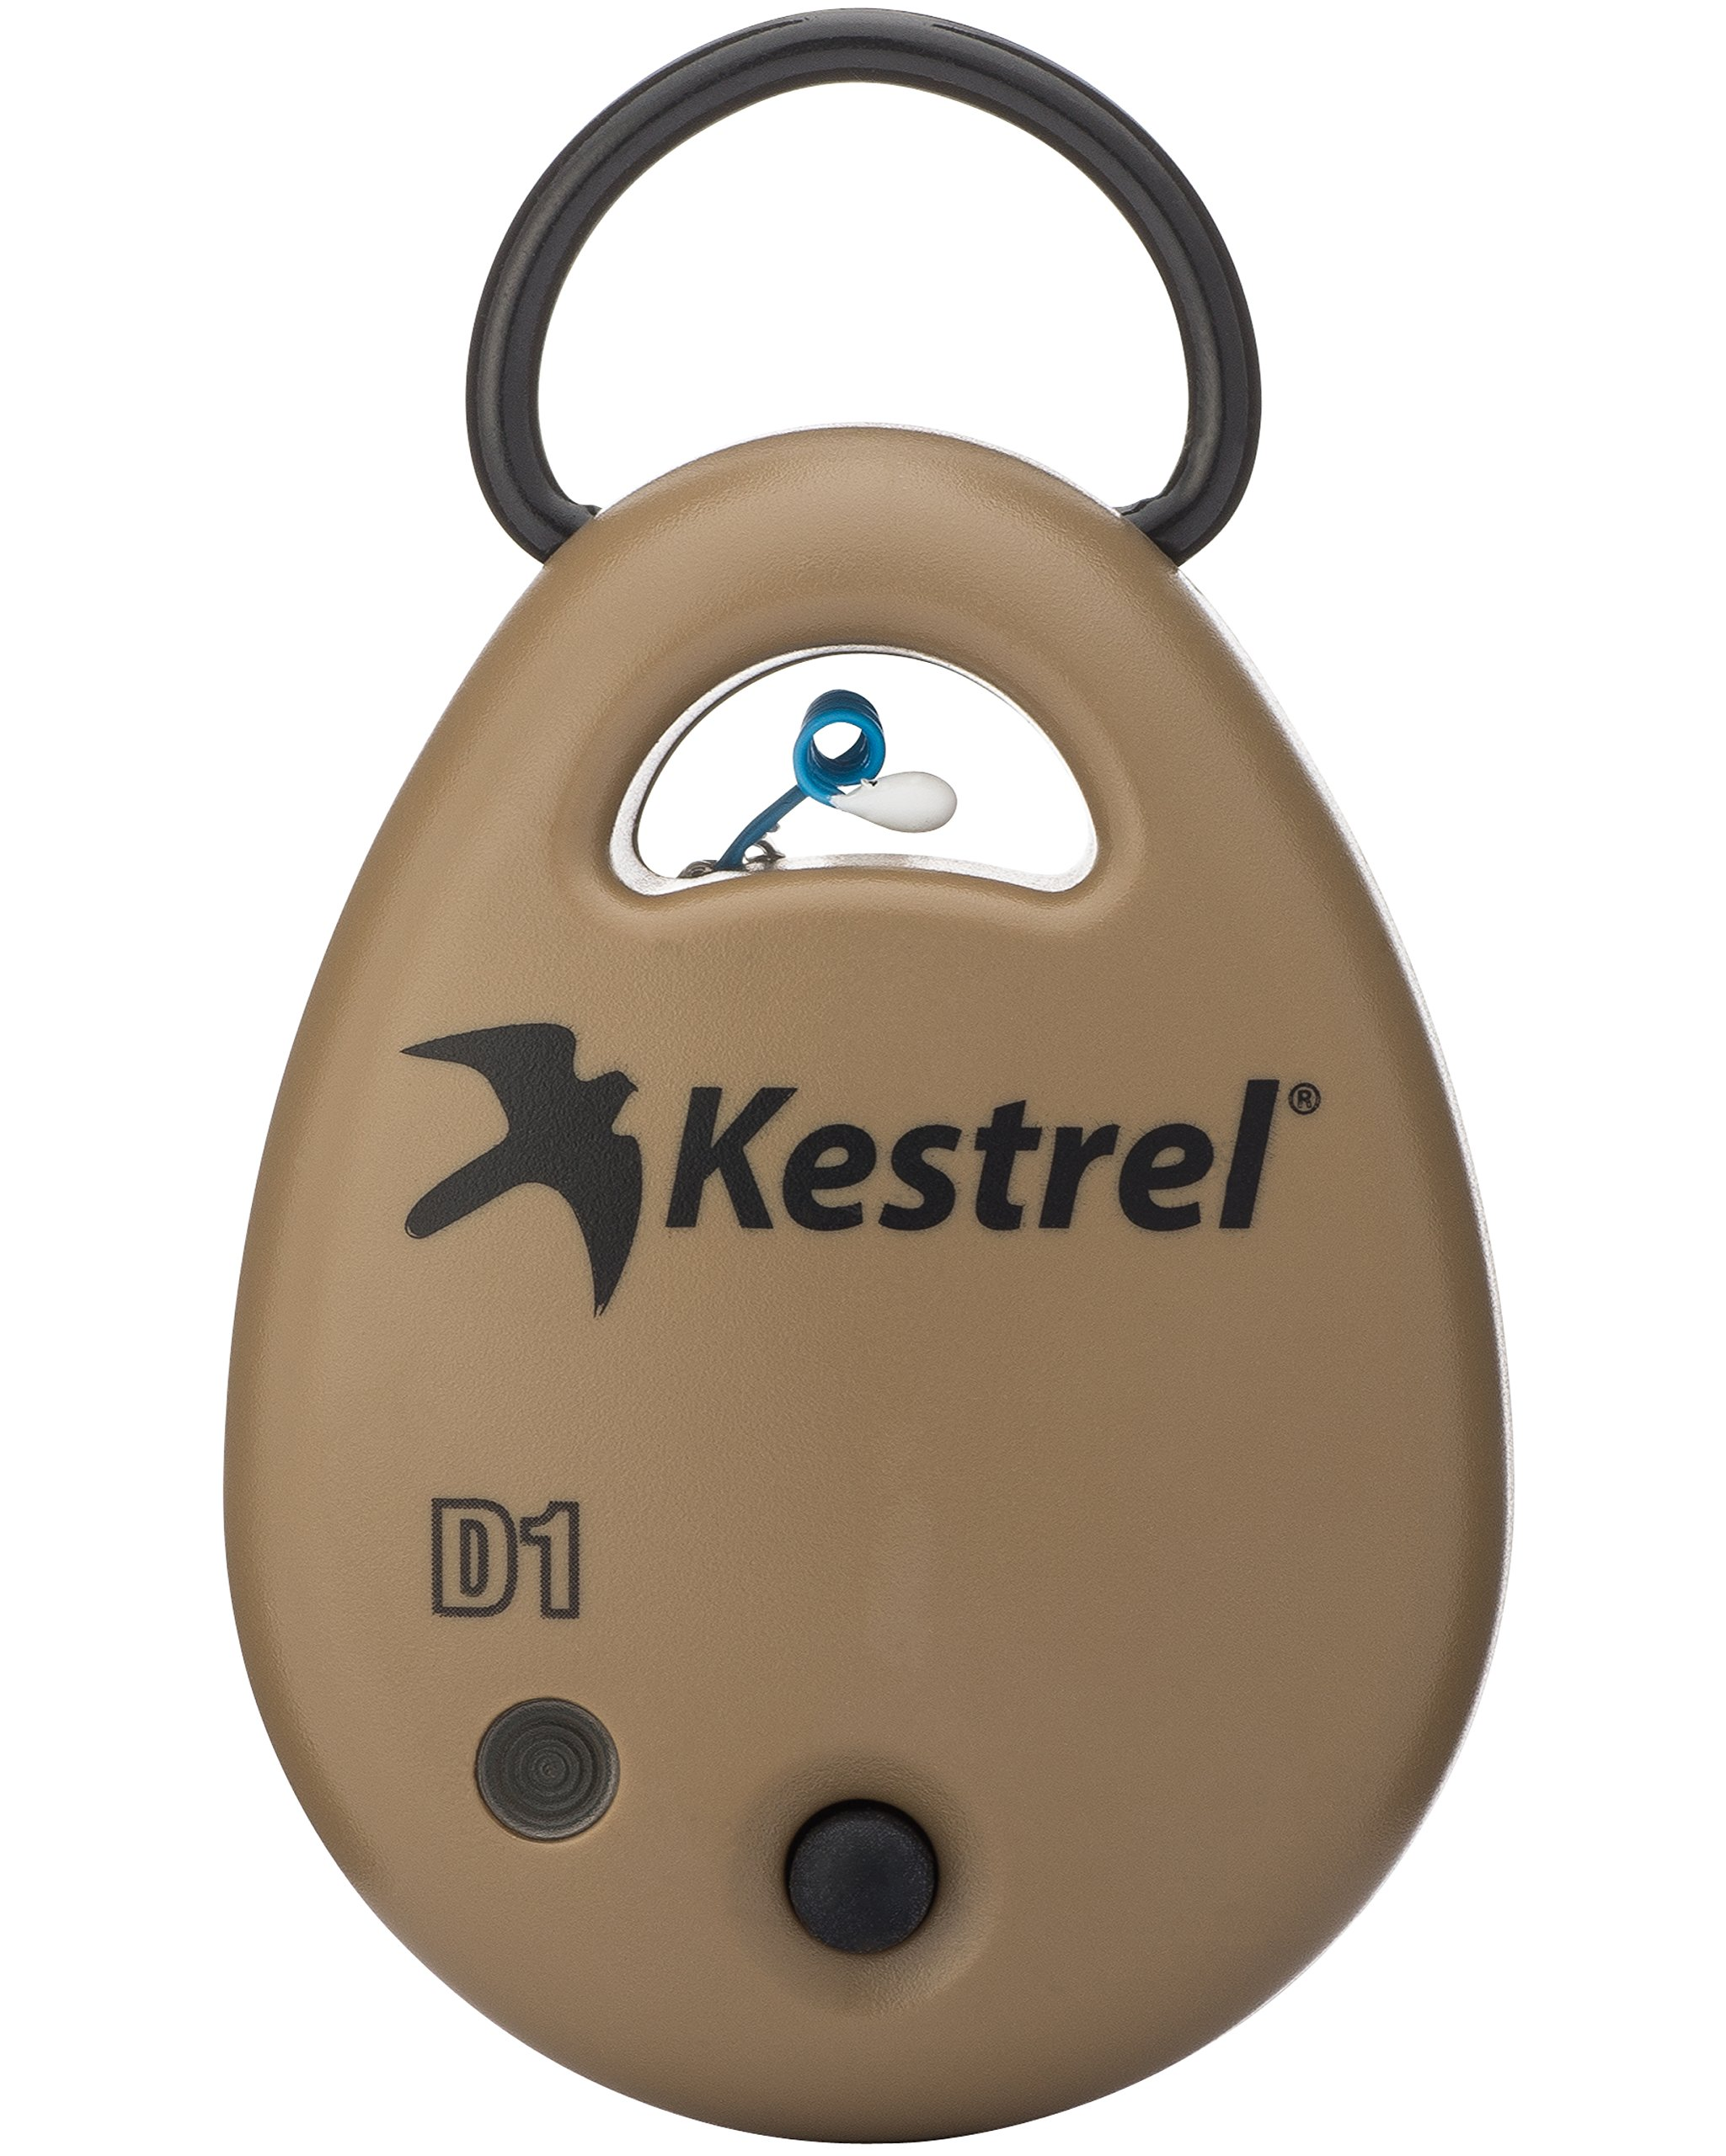 Kestrel Drop 1 Smart Temperature Data Logger by Kestrel